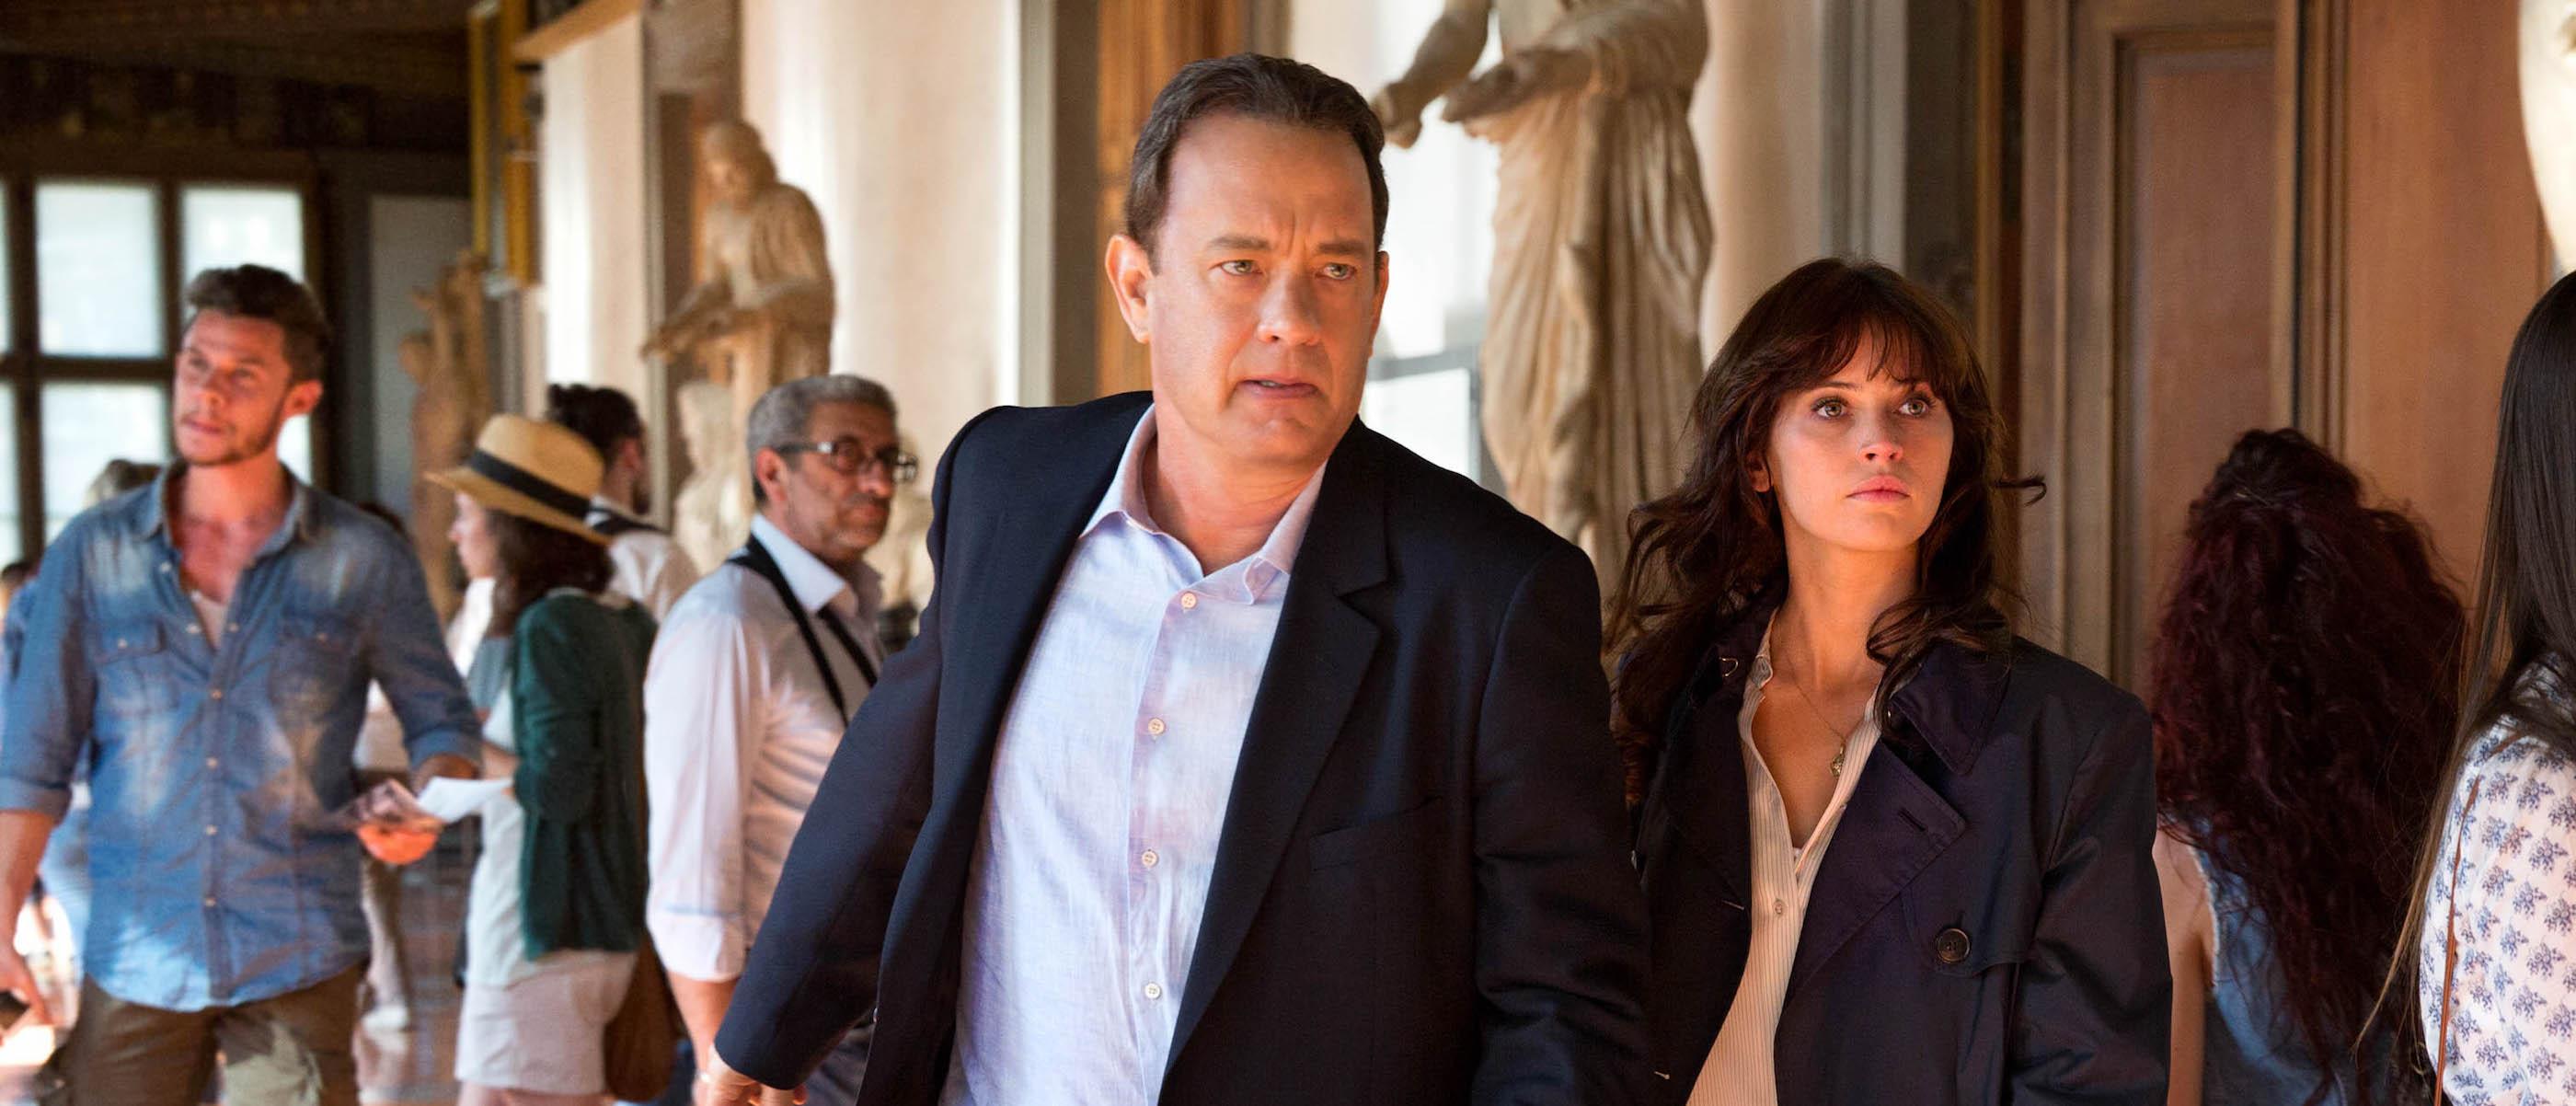 Da Vinci Code Sequel Origin To Hit Shelves In 2017